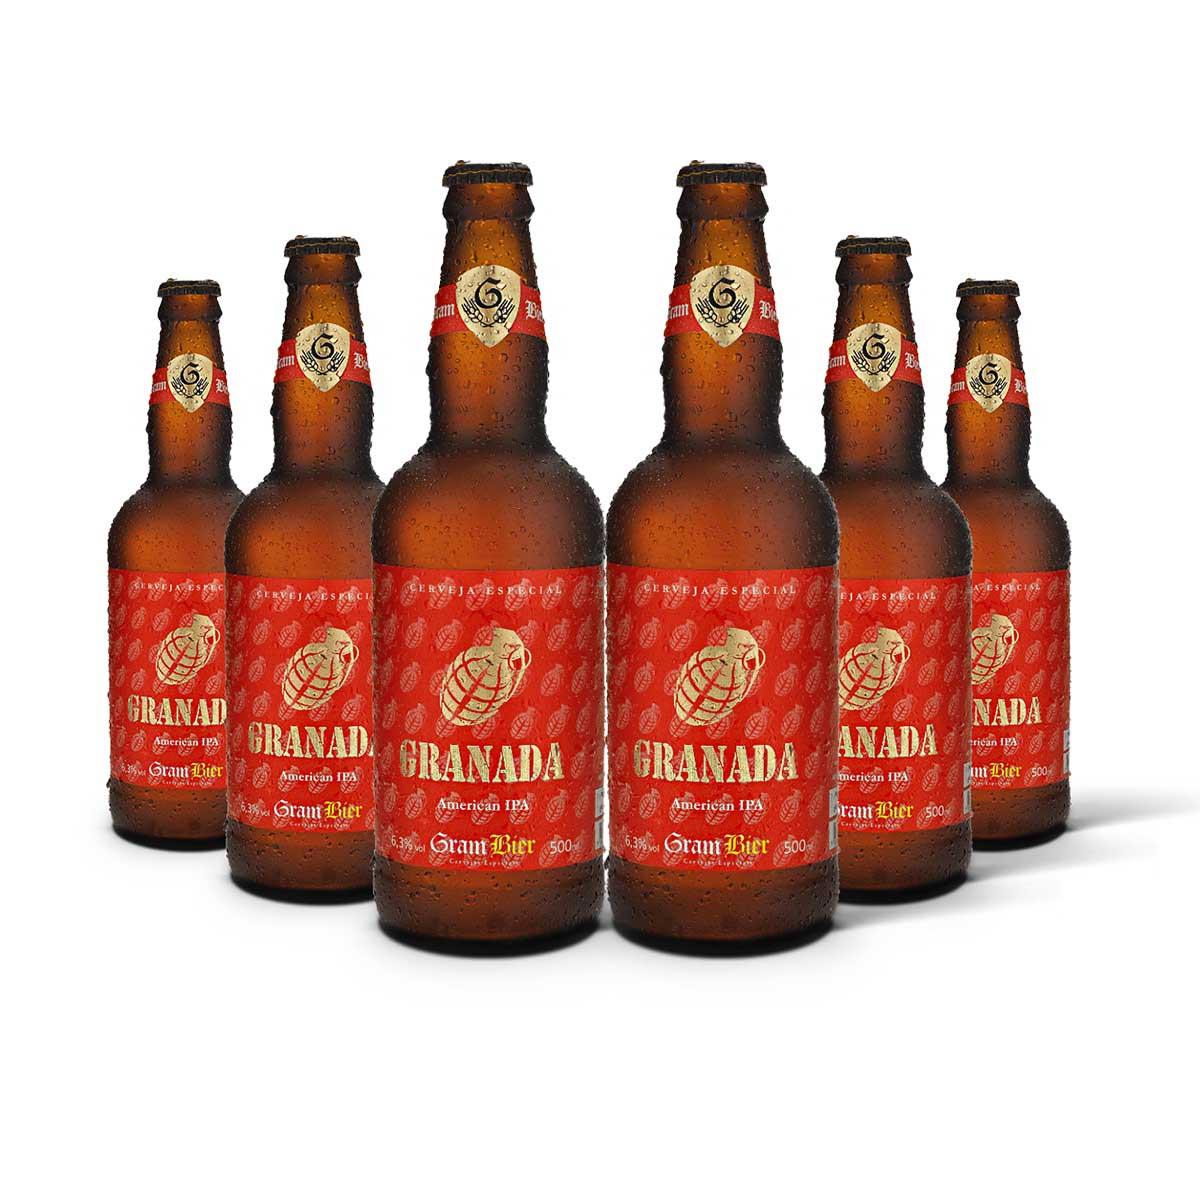 Pack Gram Bier American IPA Granada 6 cervejas 500ml